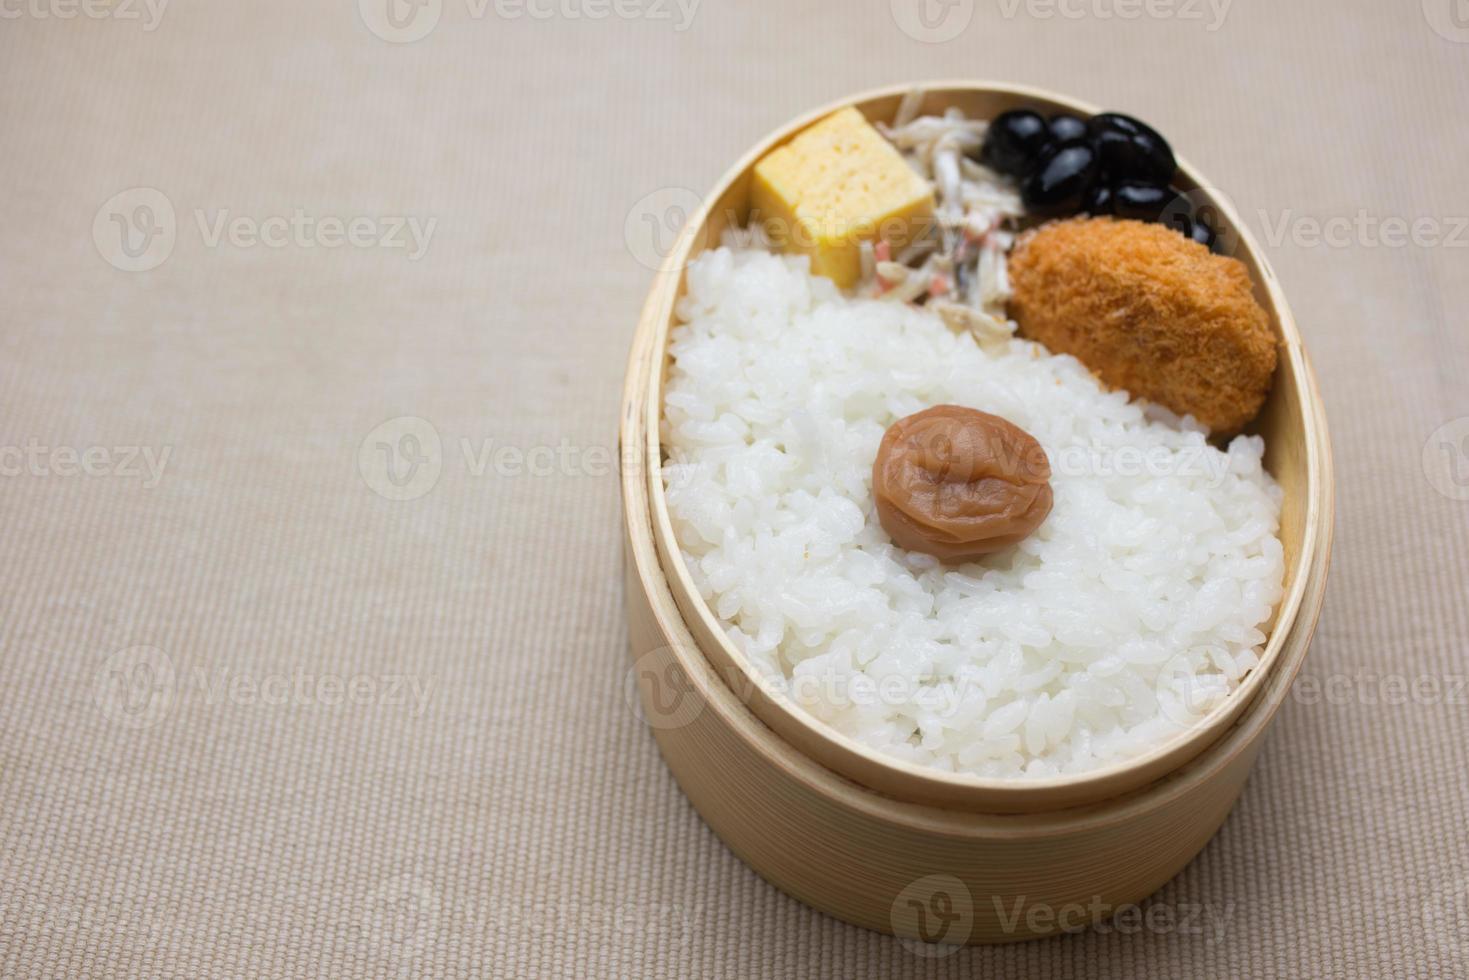 lunch box giapponese hinomaru bento (日 の 丸 弁 当) foto